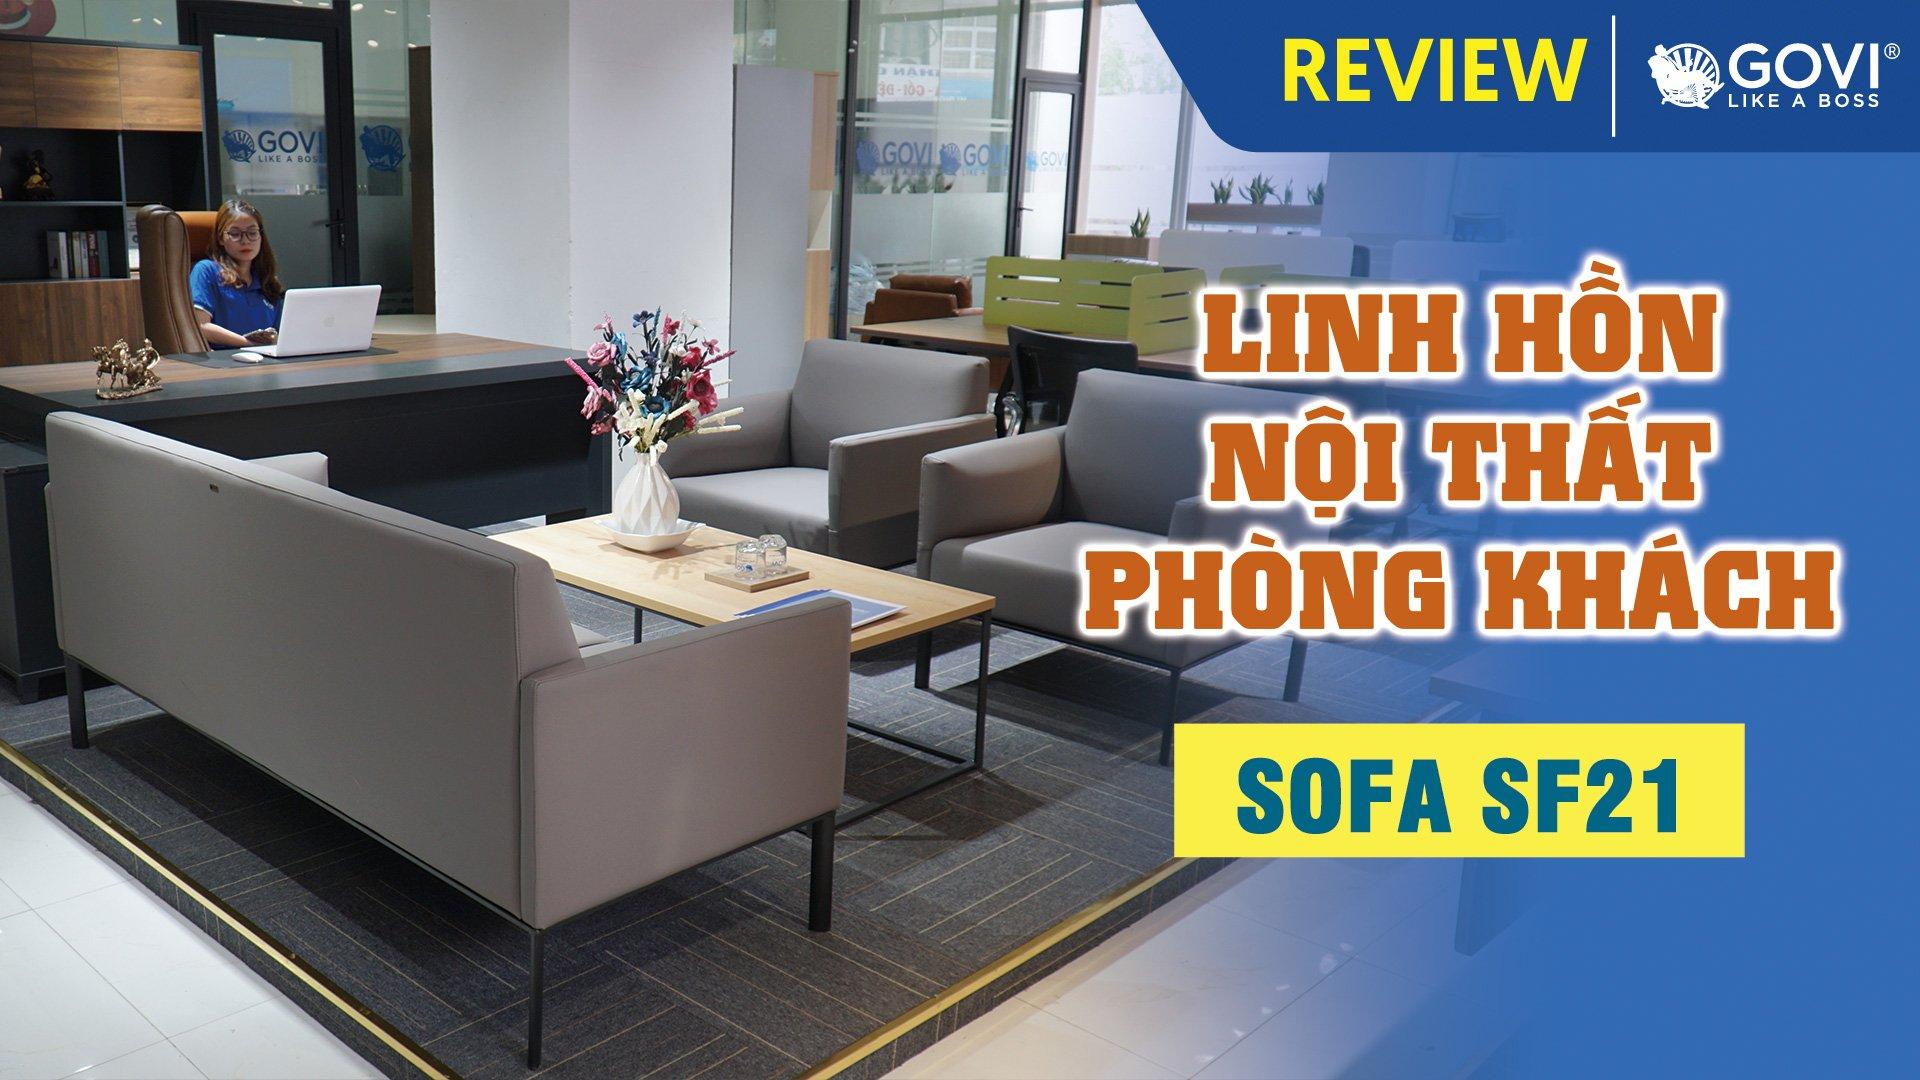 Sofa Da Cao Cấp SF21 – Linh Hồn Nội Thất Phòng Khách